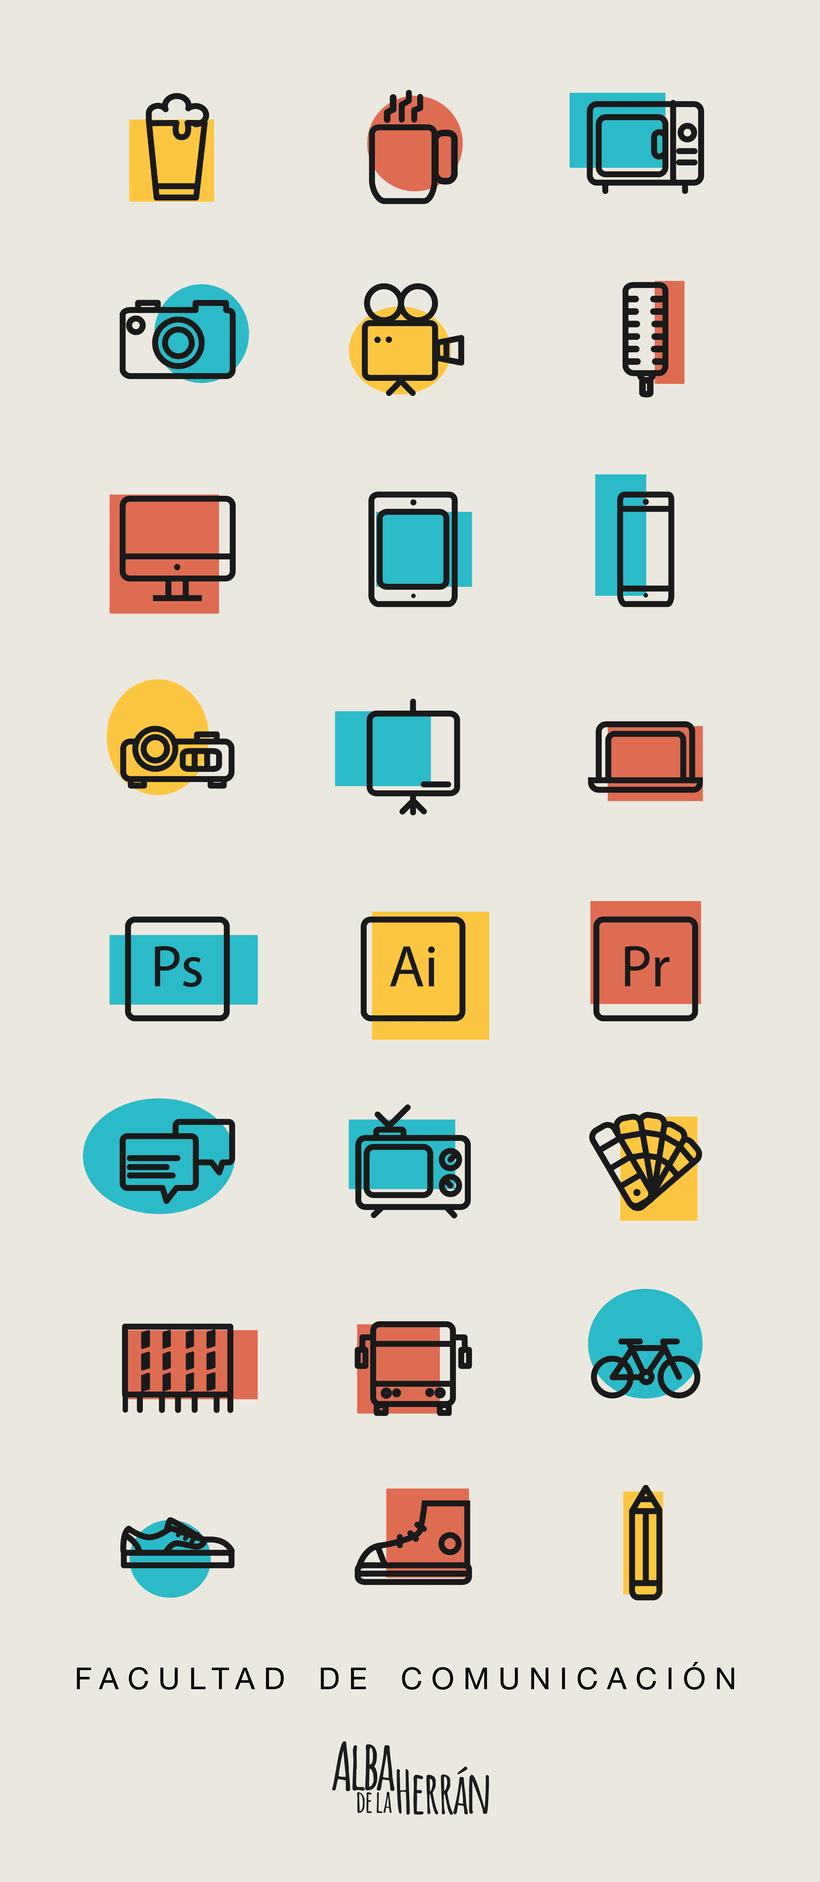 Librería de iconos 0